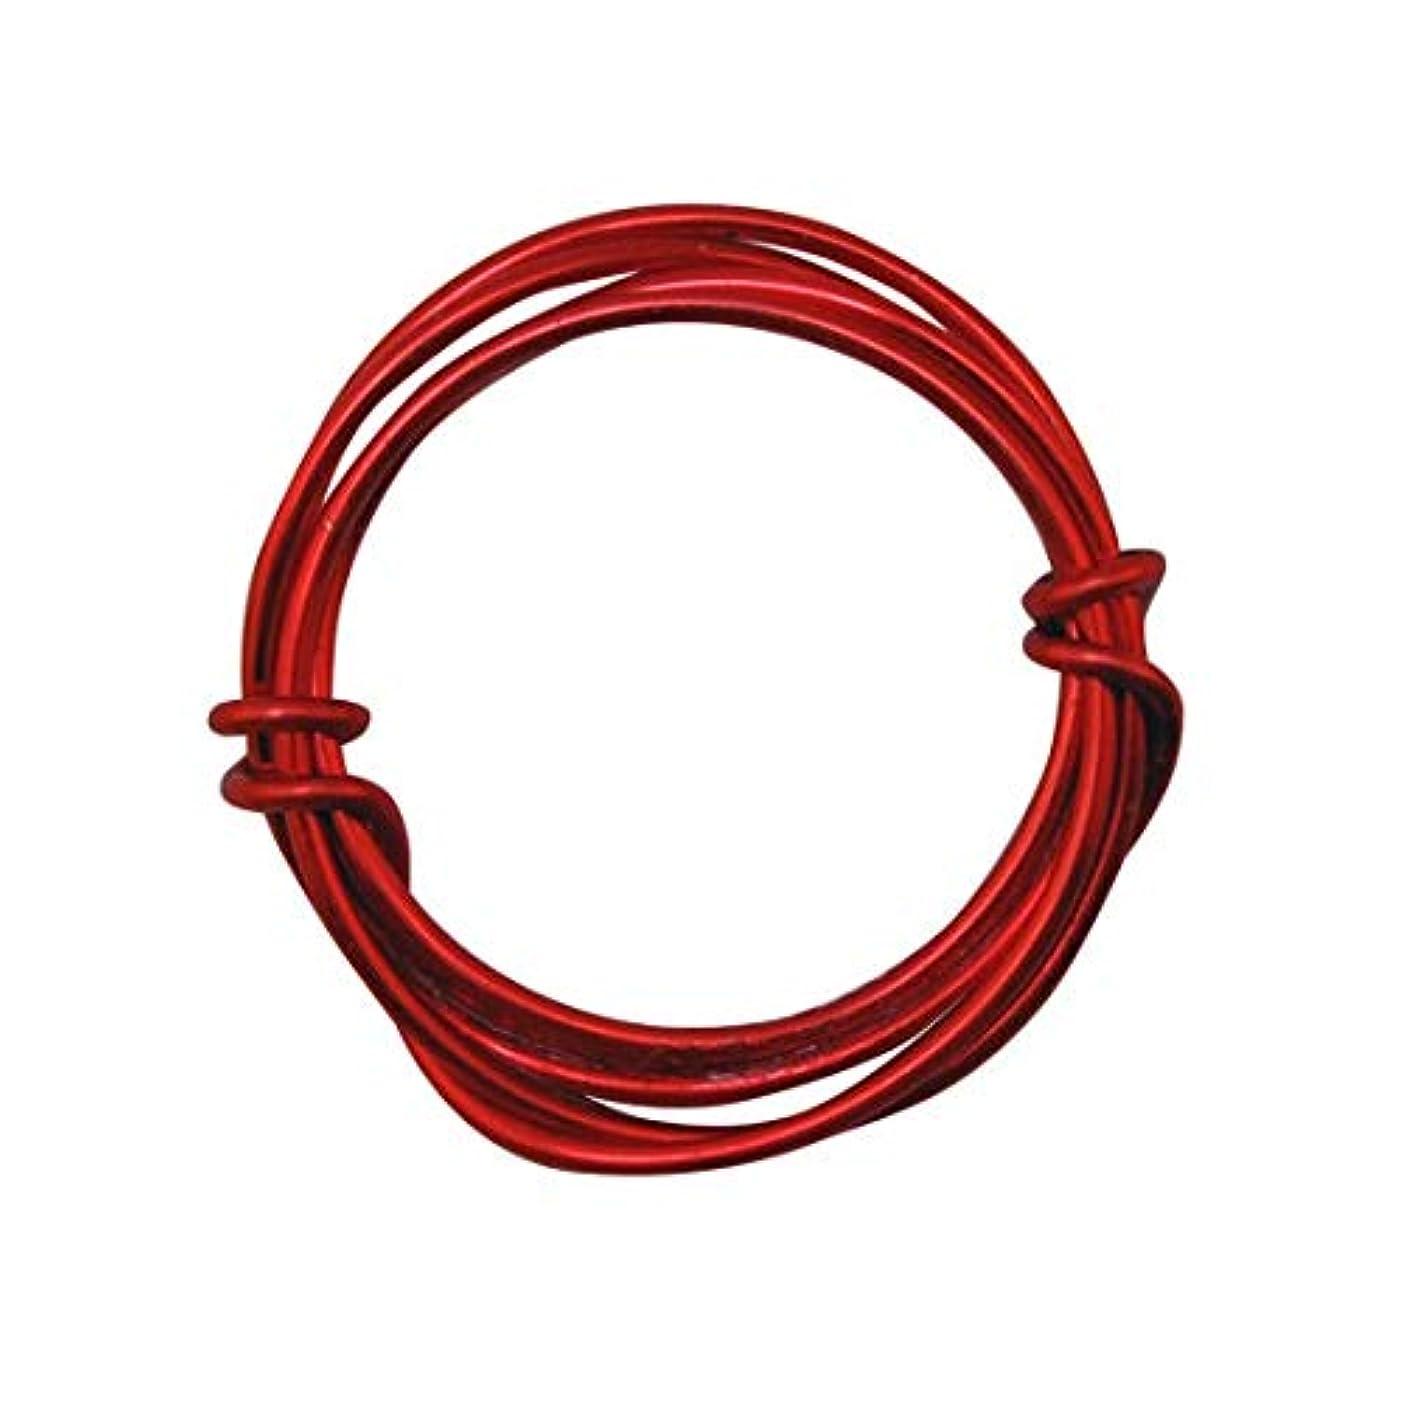 Vaessen Creative Copper Wire, Metal, Red, One Size